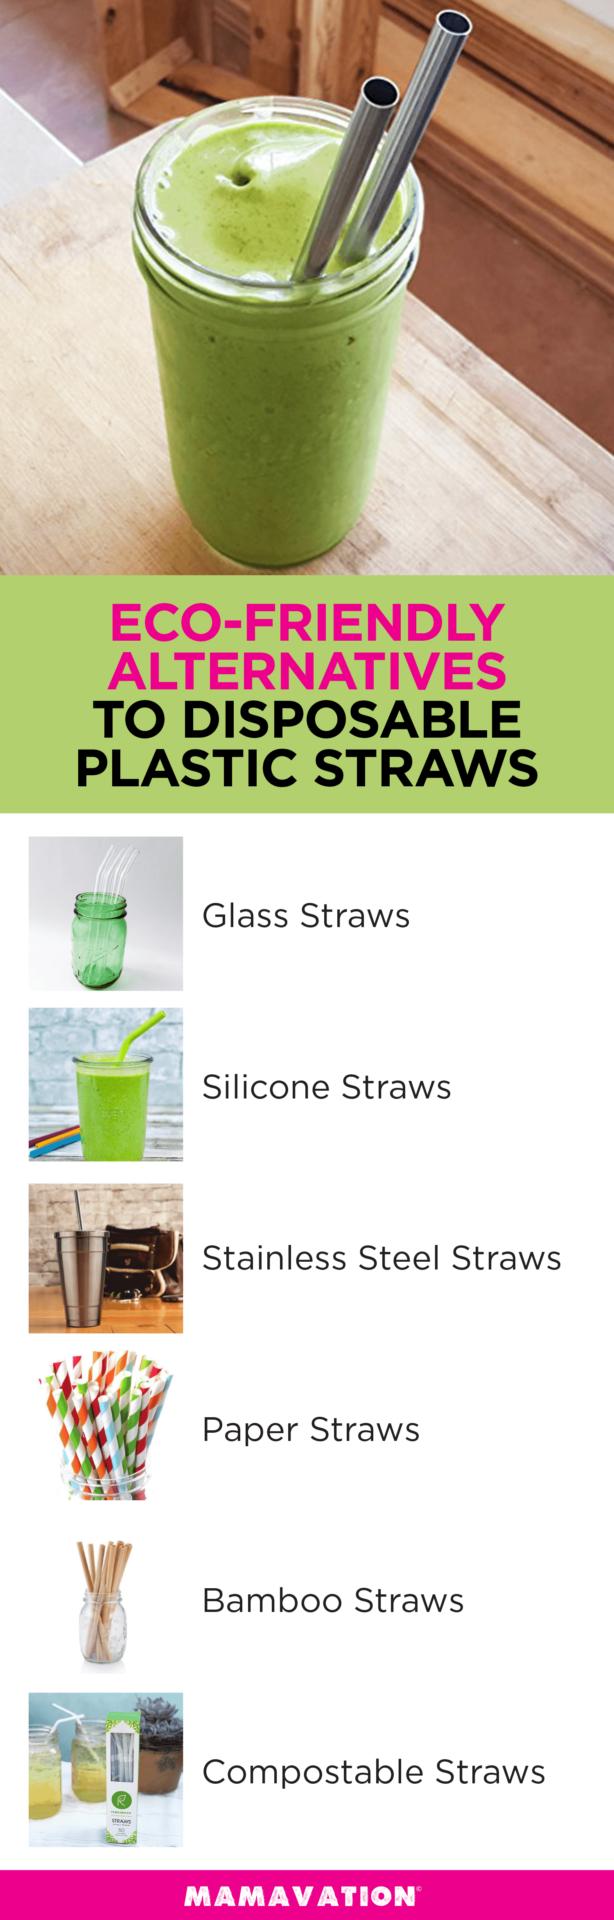 Eco-friendly alternatives to disposable plastic straws